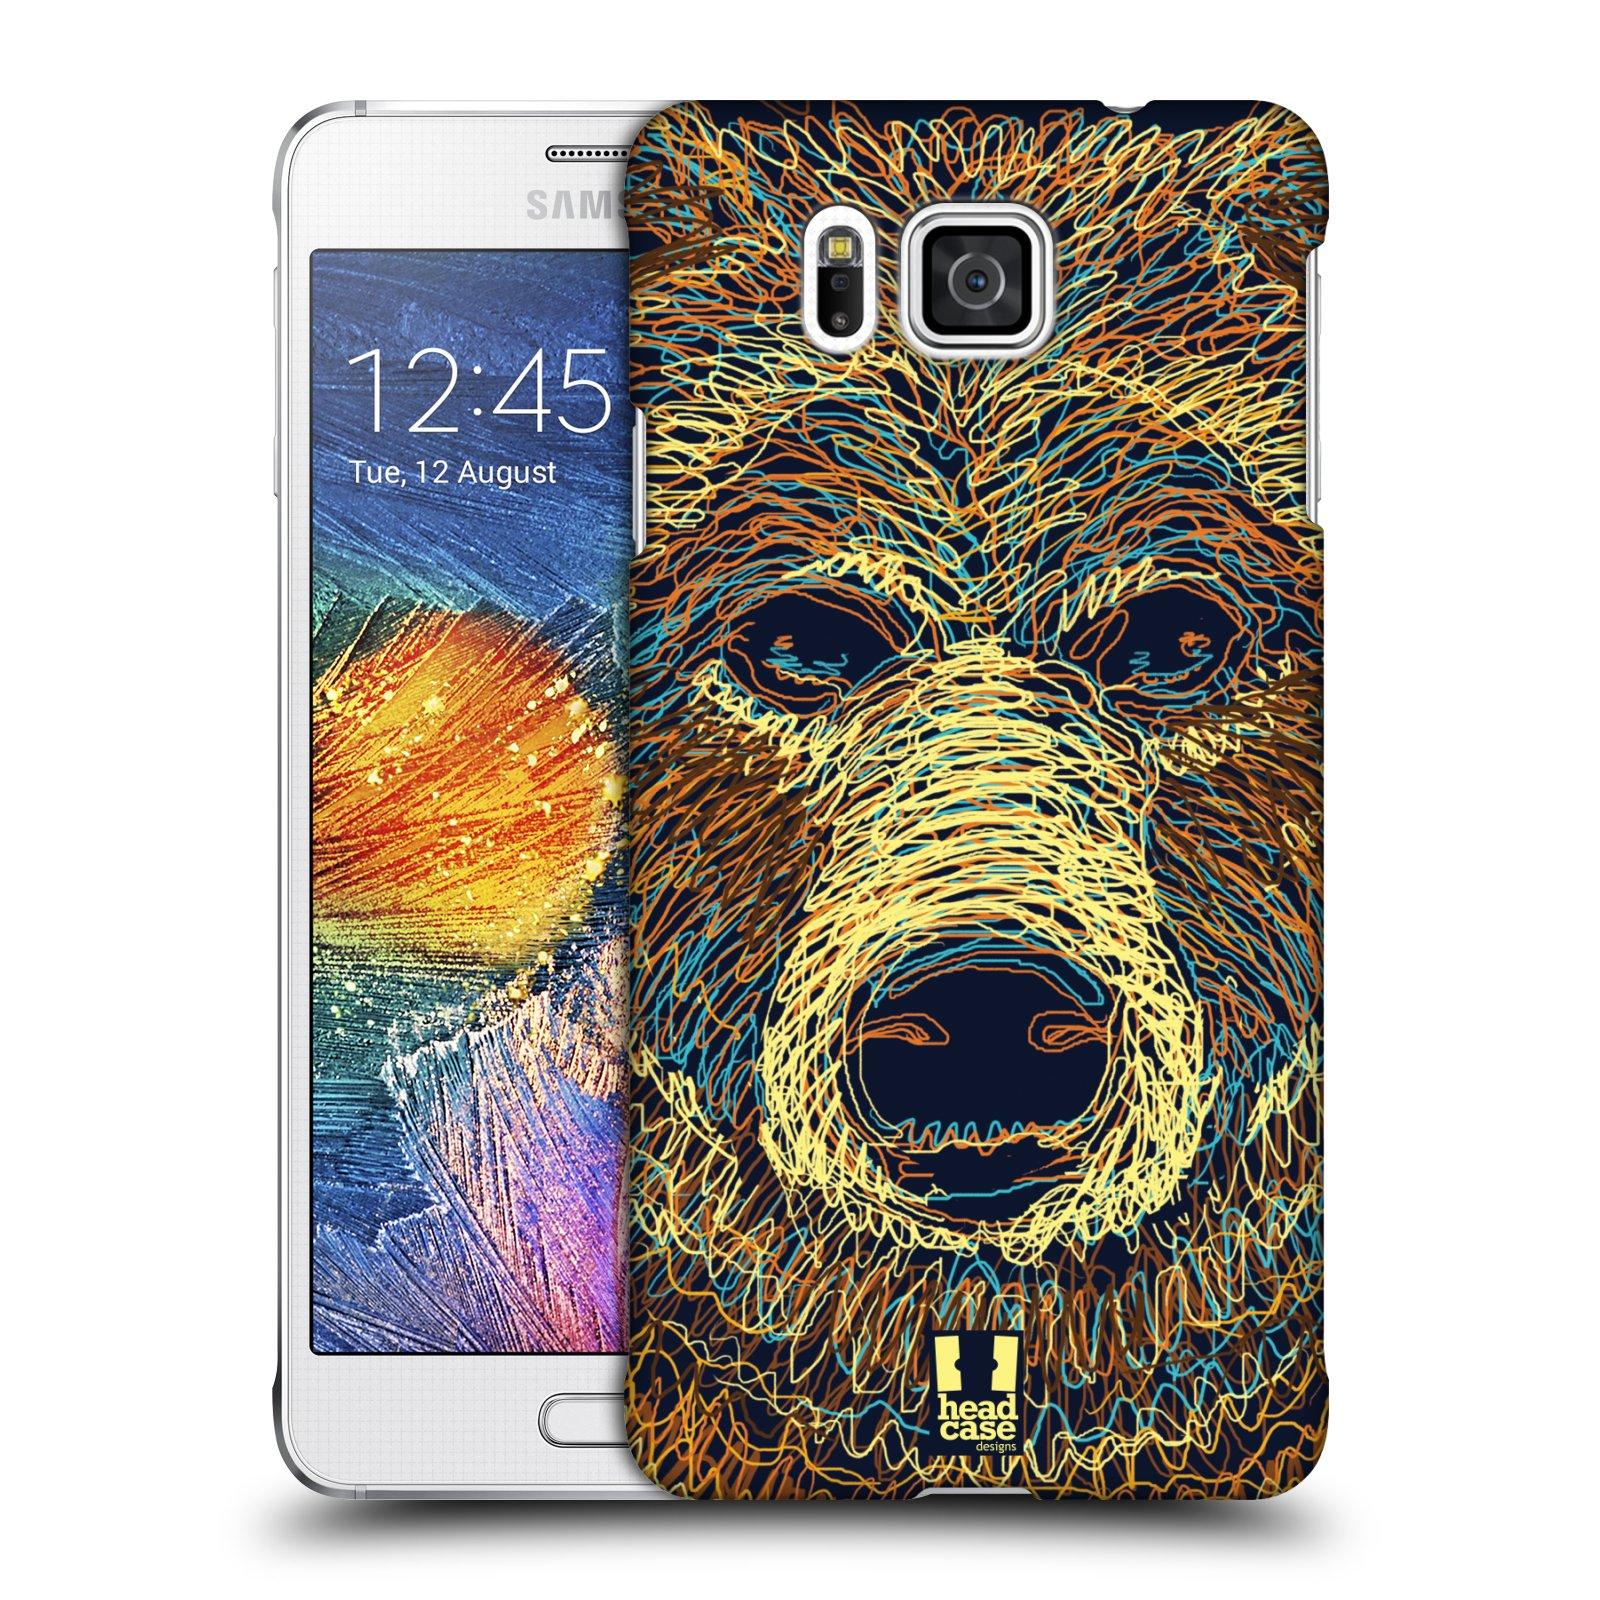 HEAD CASE plastový obal na mobil SAMSUNG Galaxy Alpha (G850) vzor zvíře čmáranice medvěd